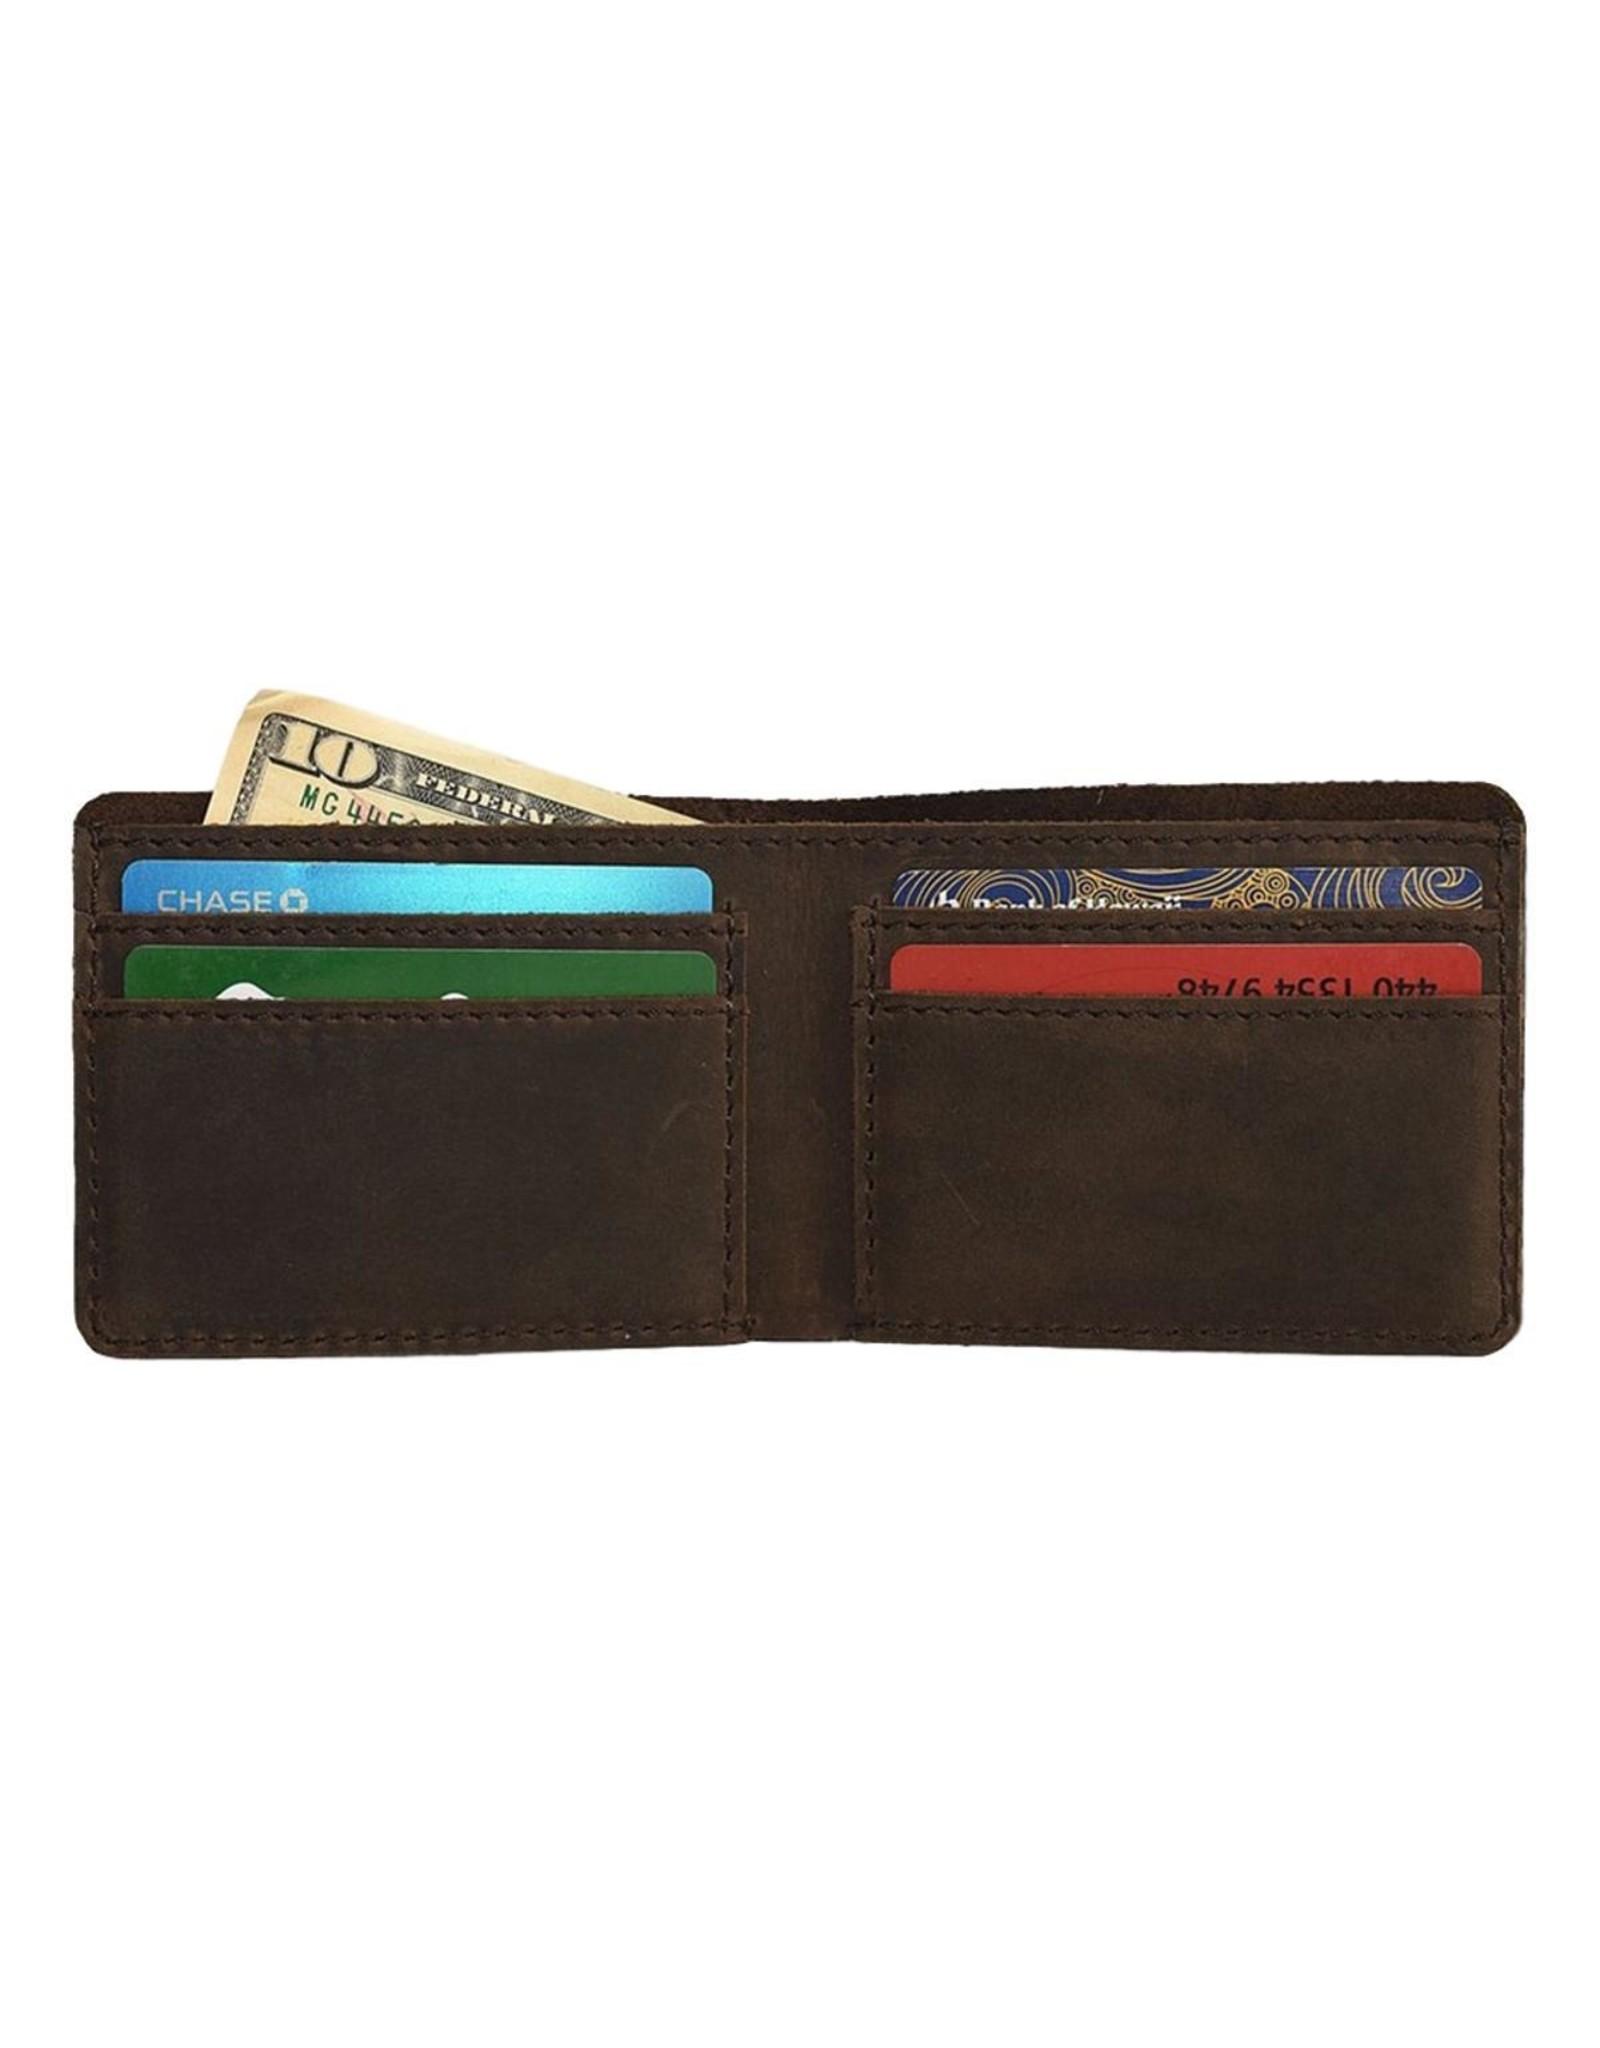 Kiko Leather Step Up Wallet